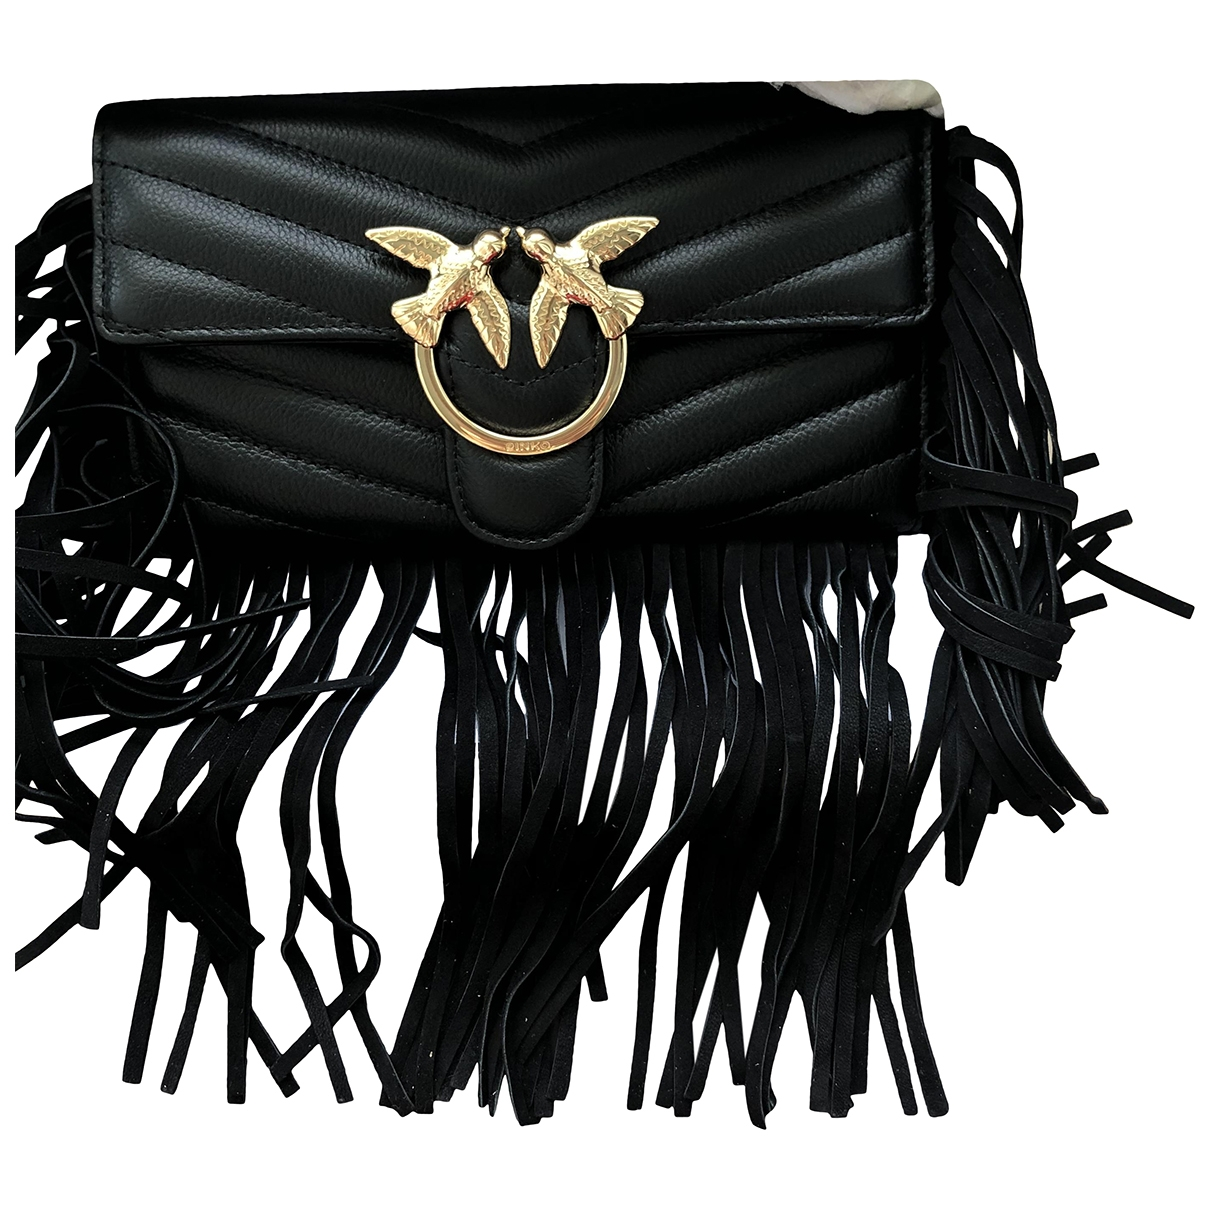 Pinko Love Bag Handtasche in  Schwarz Leder